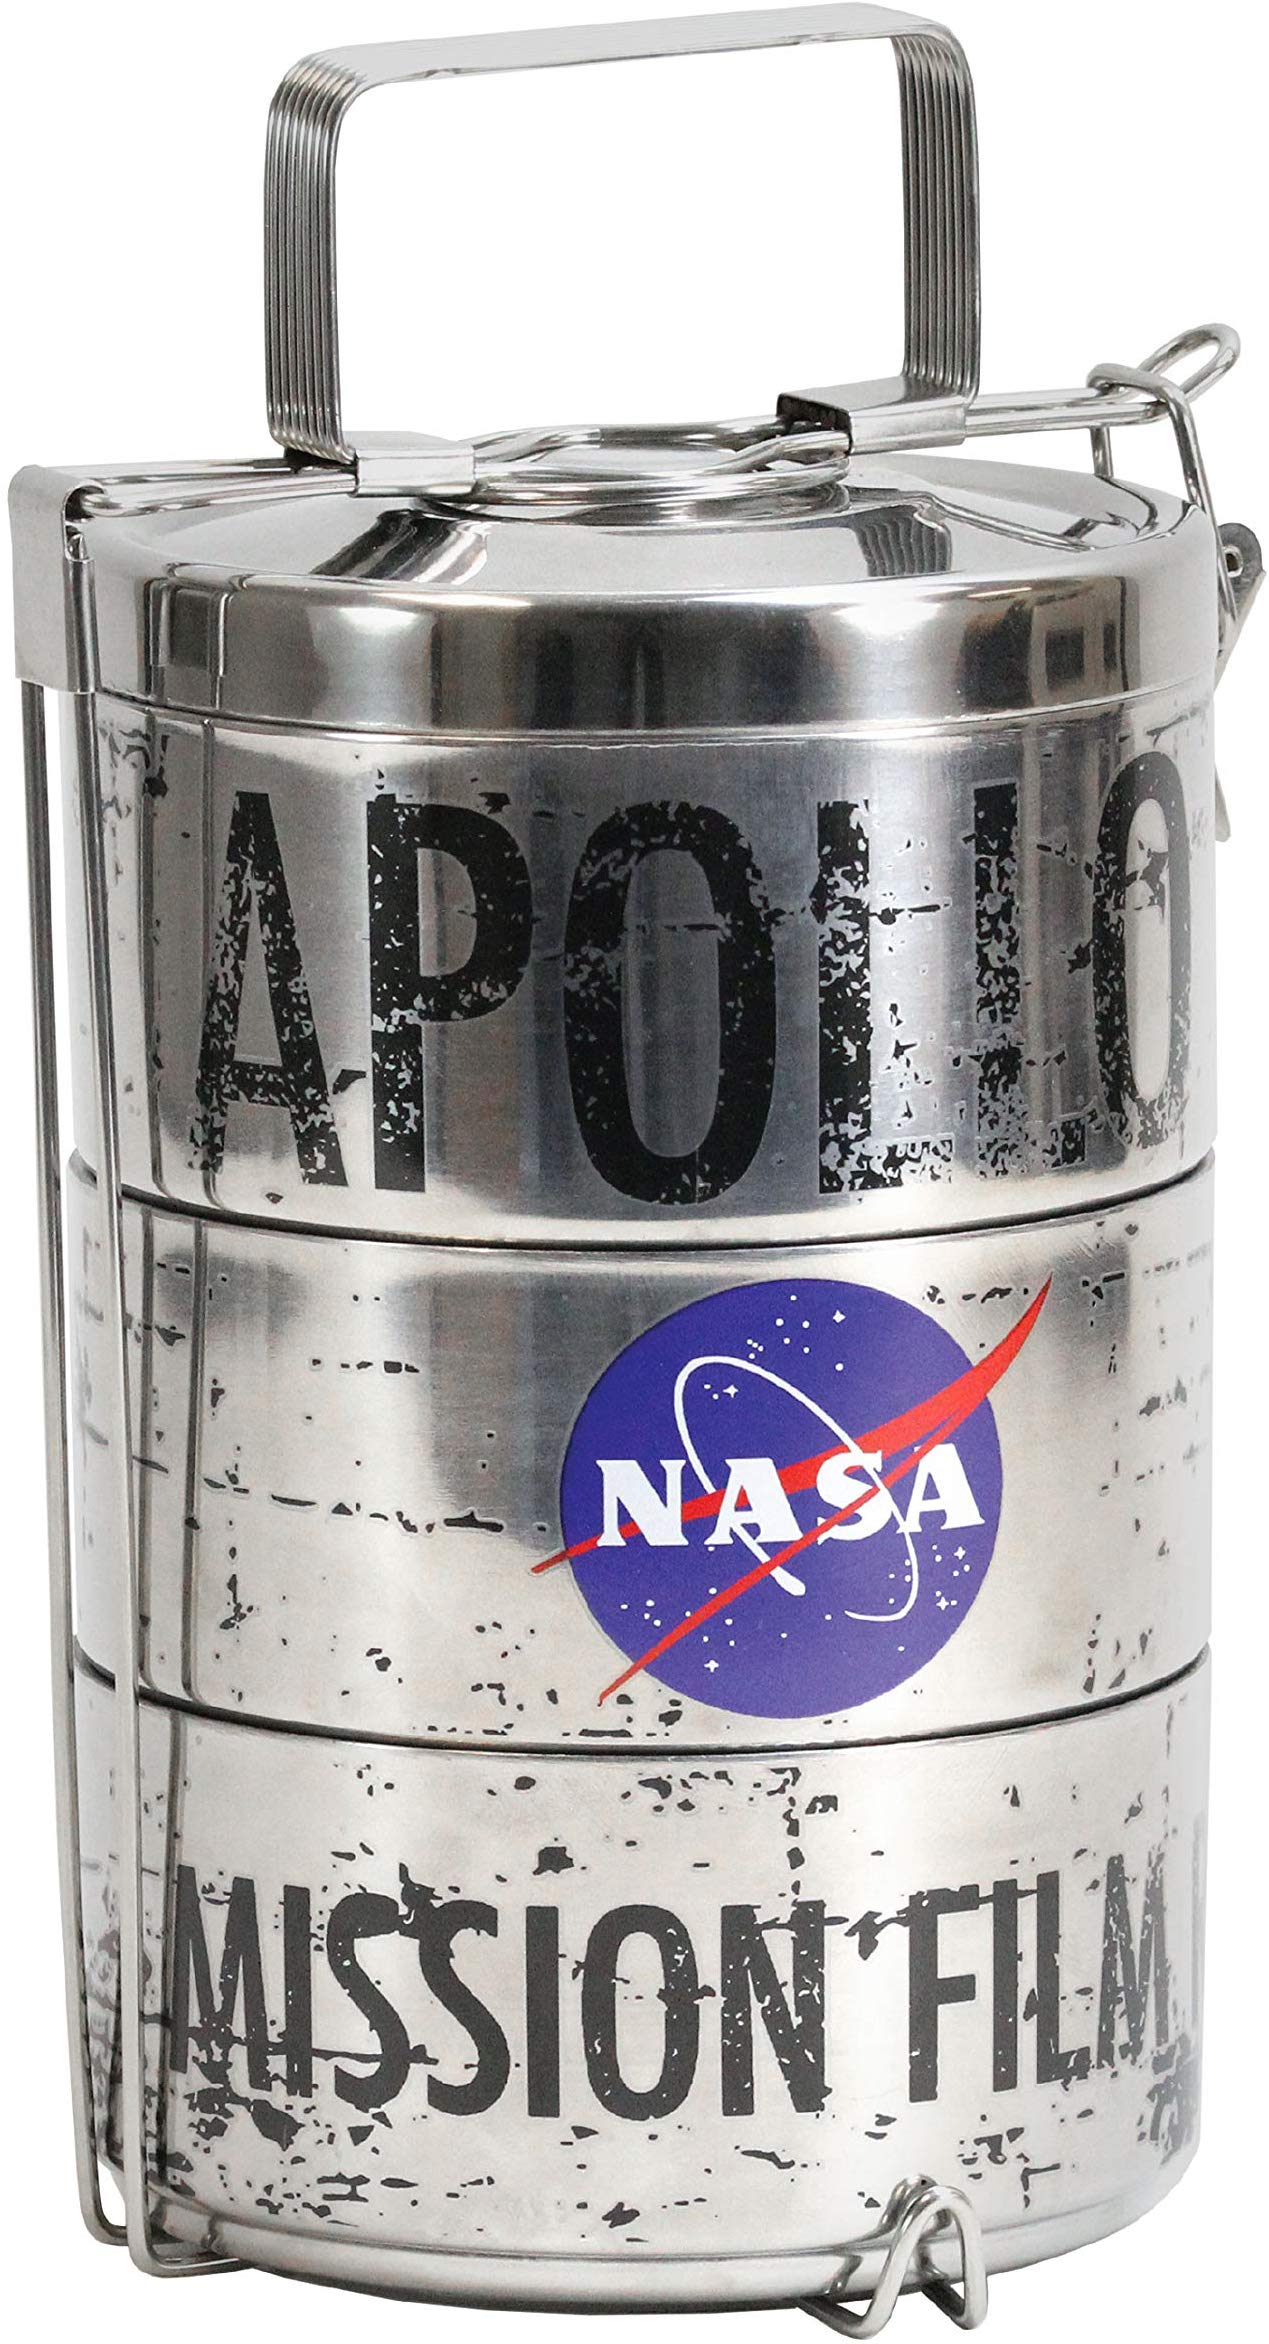 NASA Apollo Moon Landing Film Canister Lunch Tins - NASO520